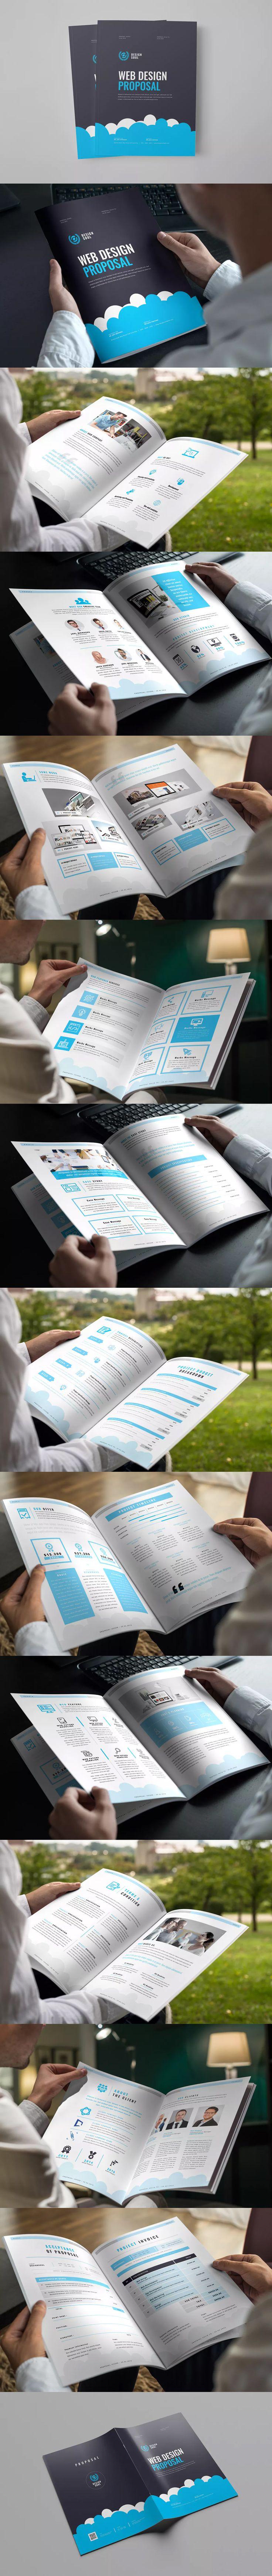 Web Design Proposal Template InDesign INDD